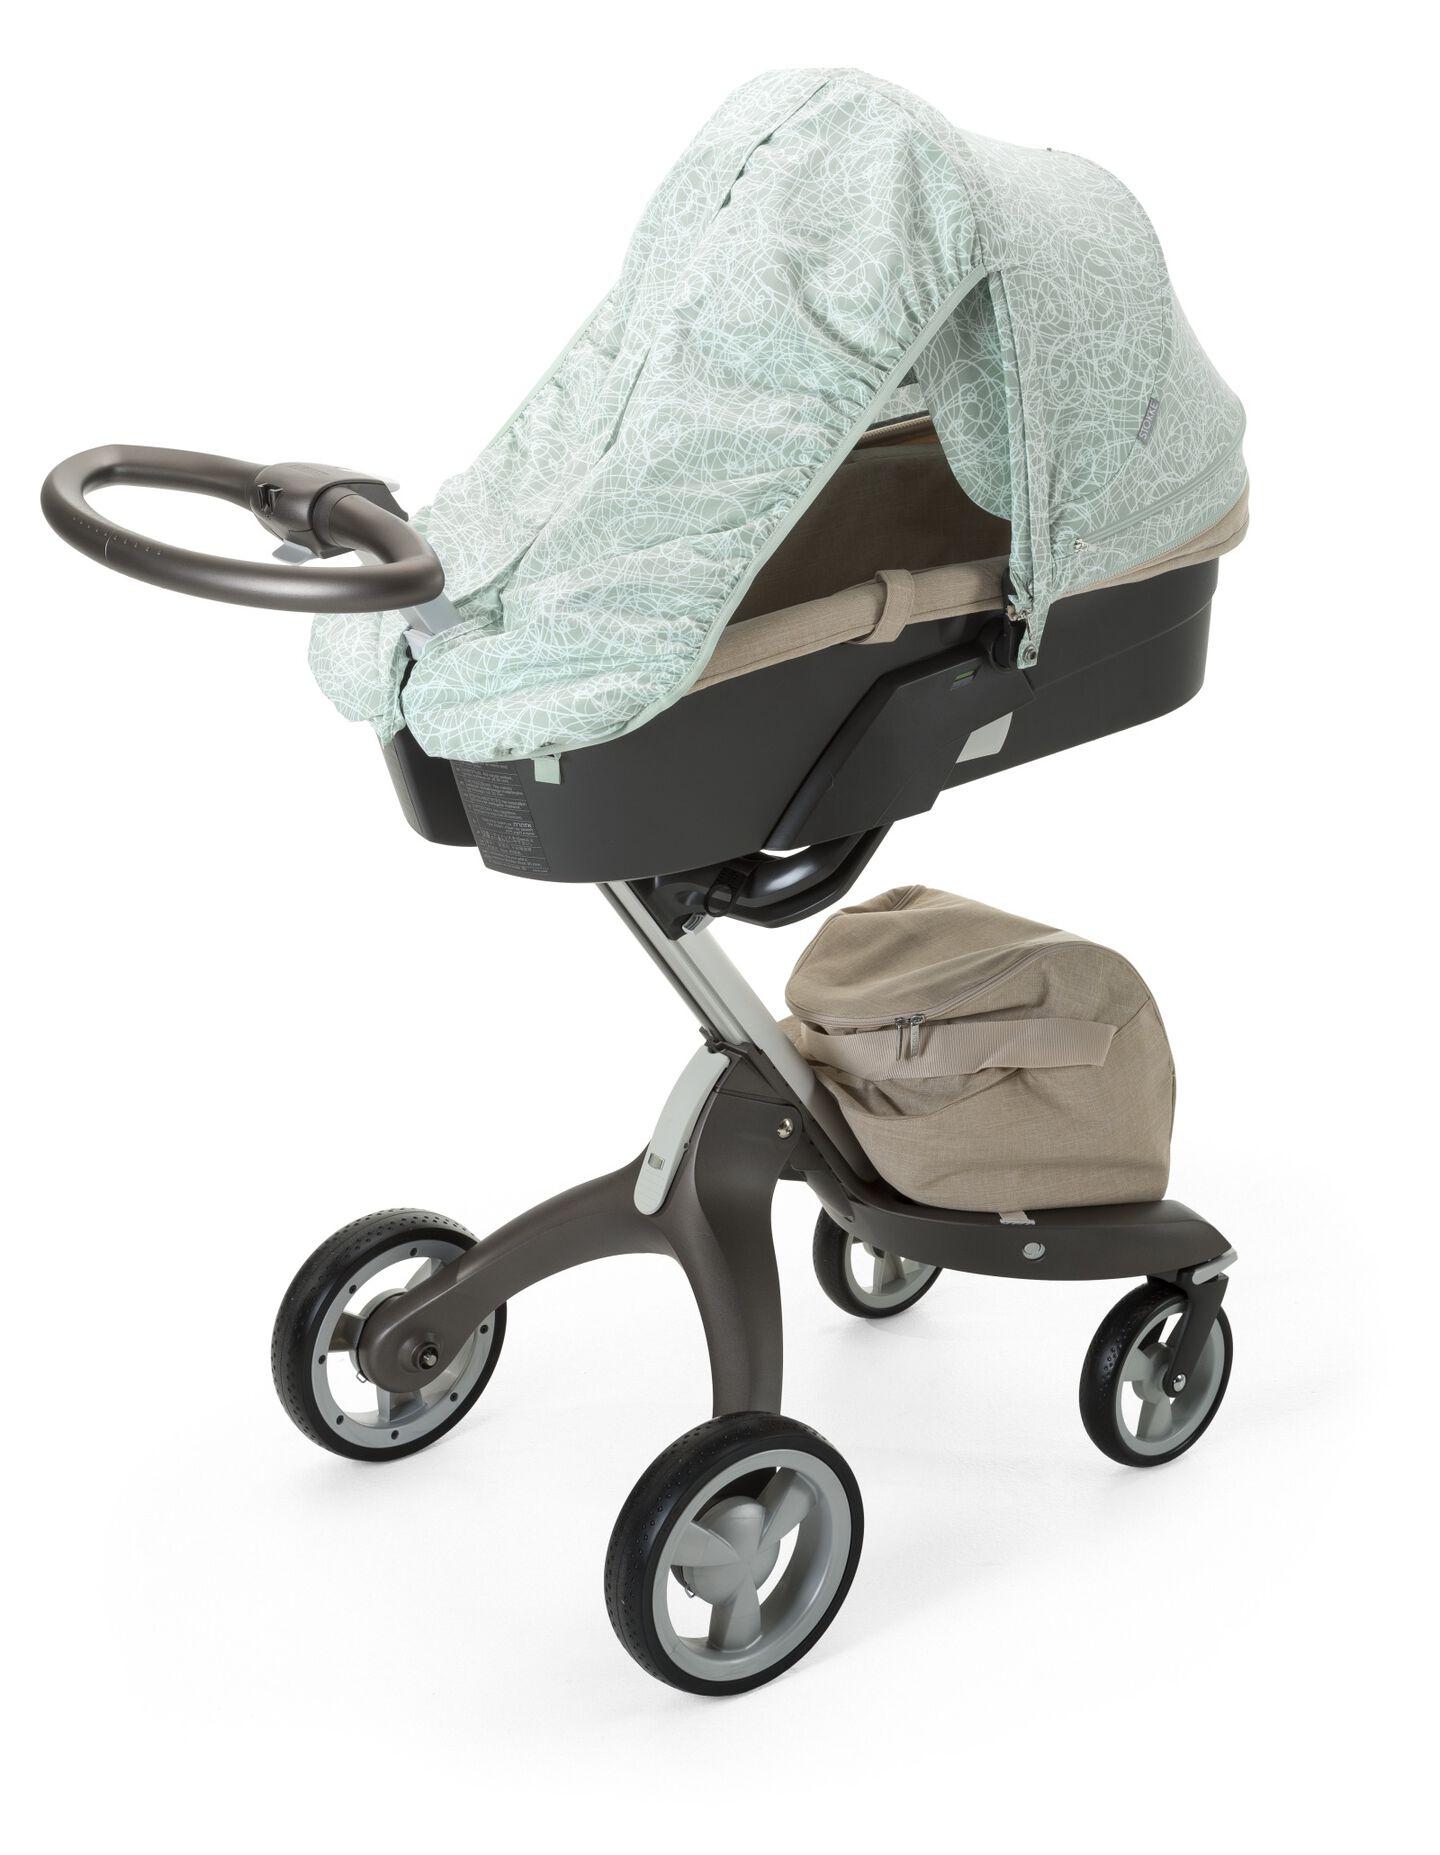 Stokke® Stroller Summer Kit Scribble Salty Blue with Stokke® Xplory® chassis, Beige Melange